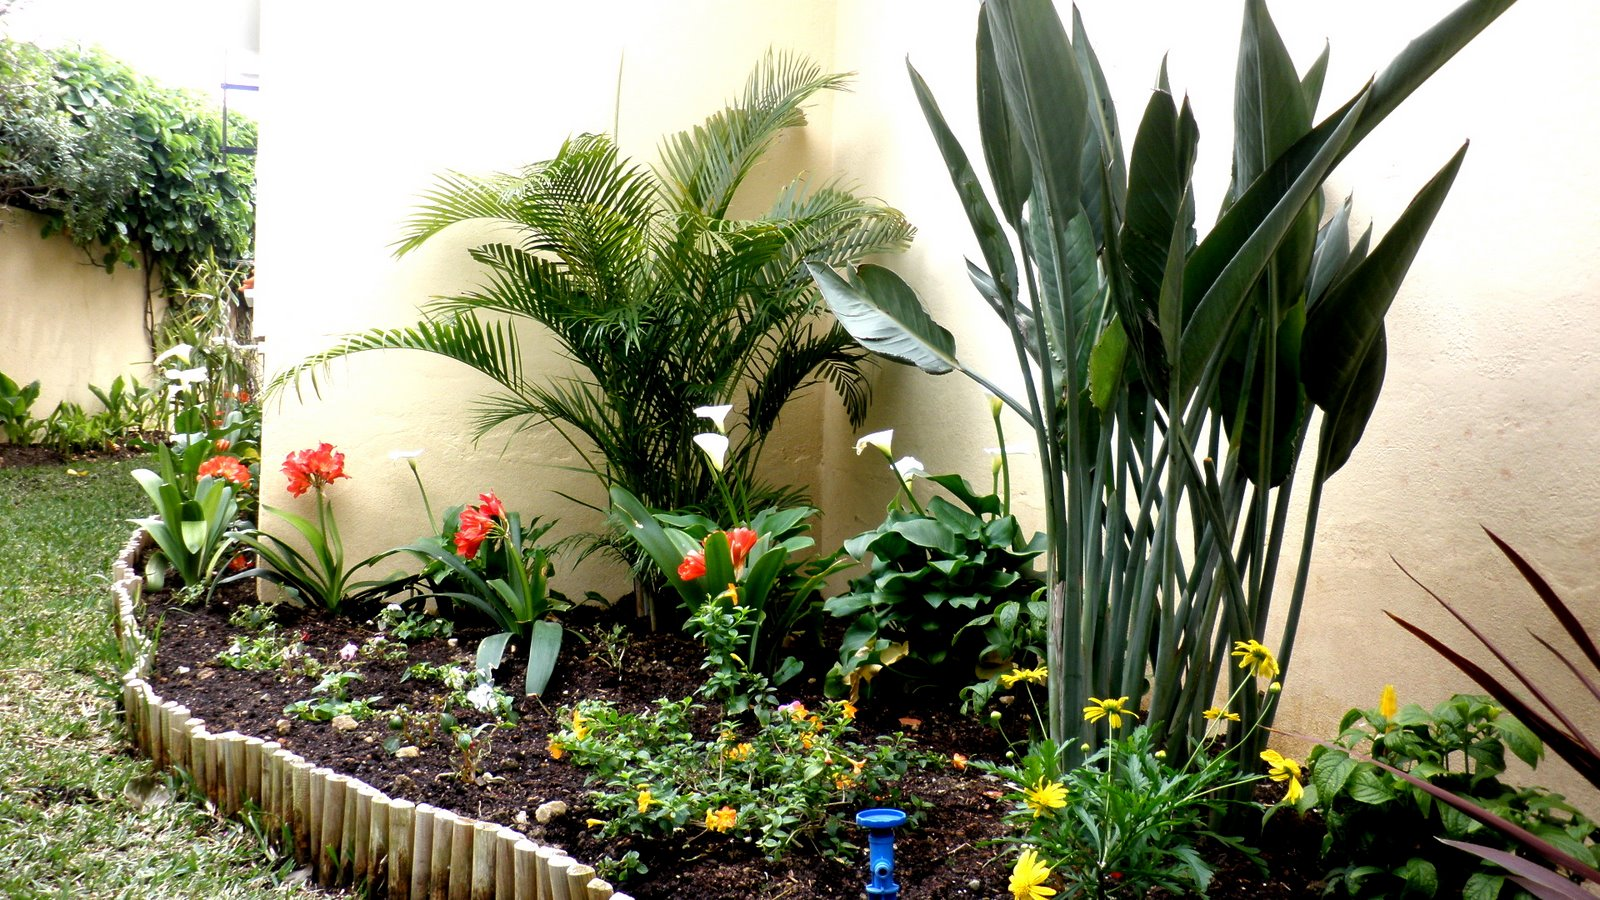 Jardinbio jardin peque o decoracion terminada iii for Como arreglar un jardin pequeno